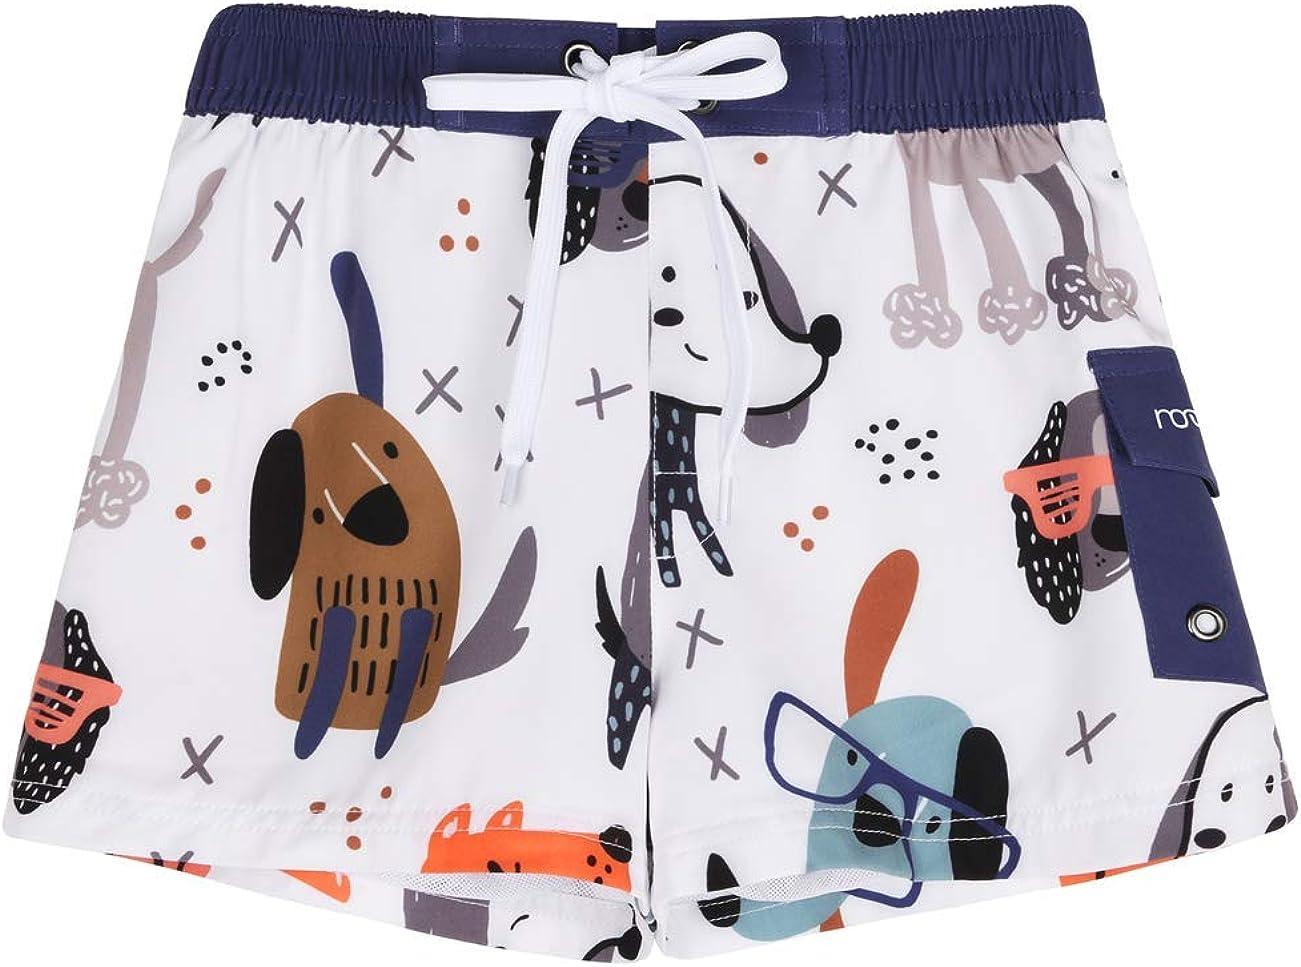 Nonwe Boy's Swim Shorts Quick Dry Printed P Special price Soft Brand new Drawsting Cargo